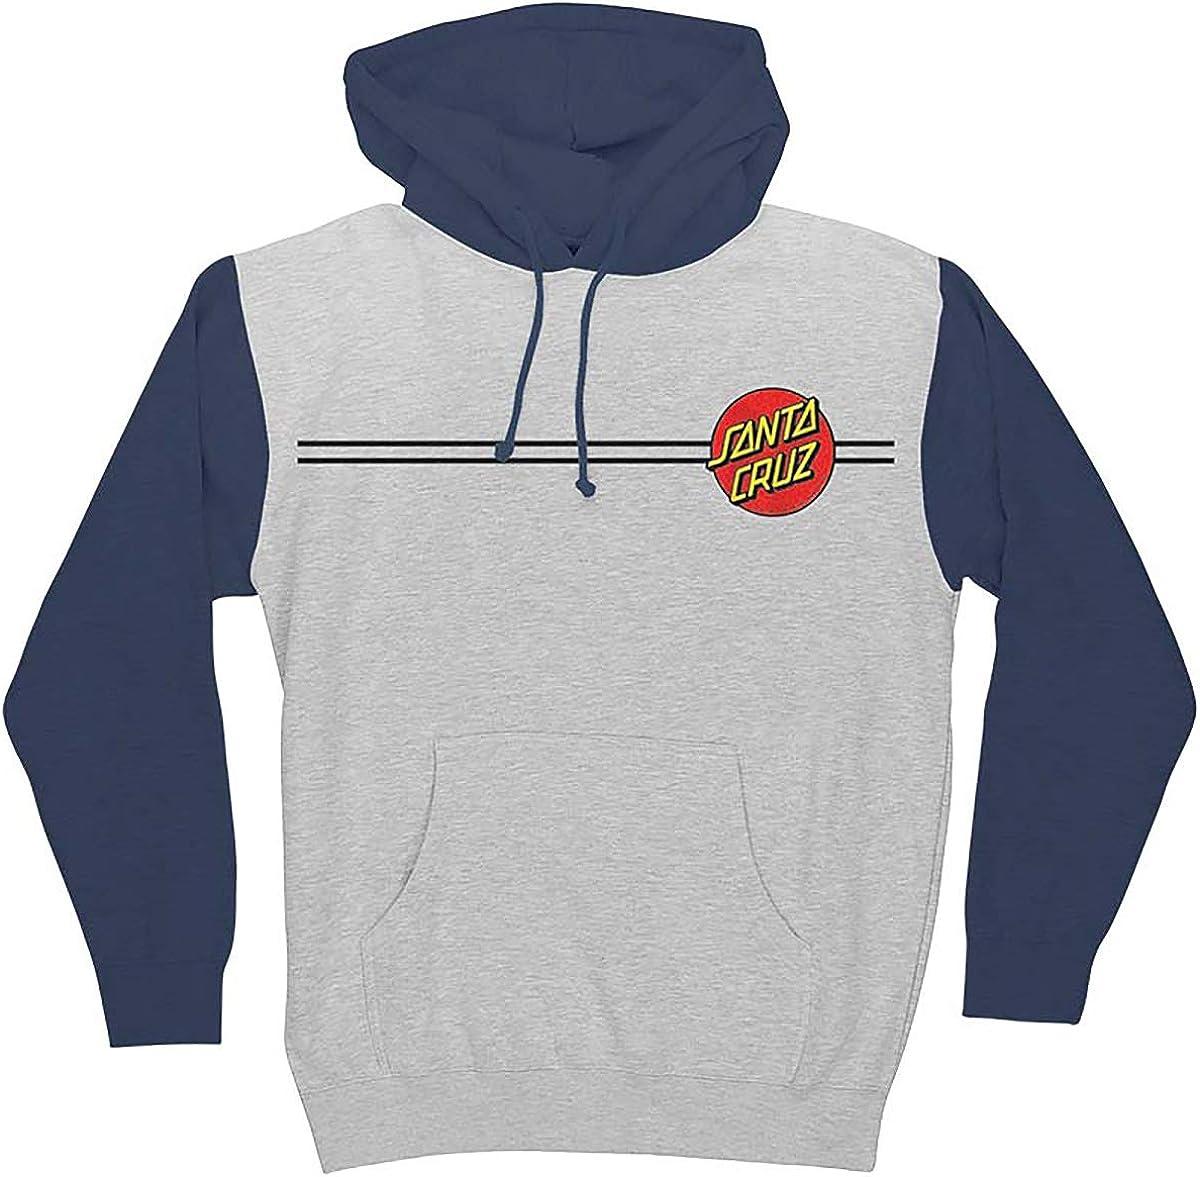 Santa Cruz Mens Classic Pullover Hoody,Meduim,Grey Heather//Slate Blue